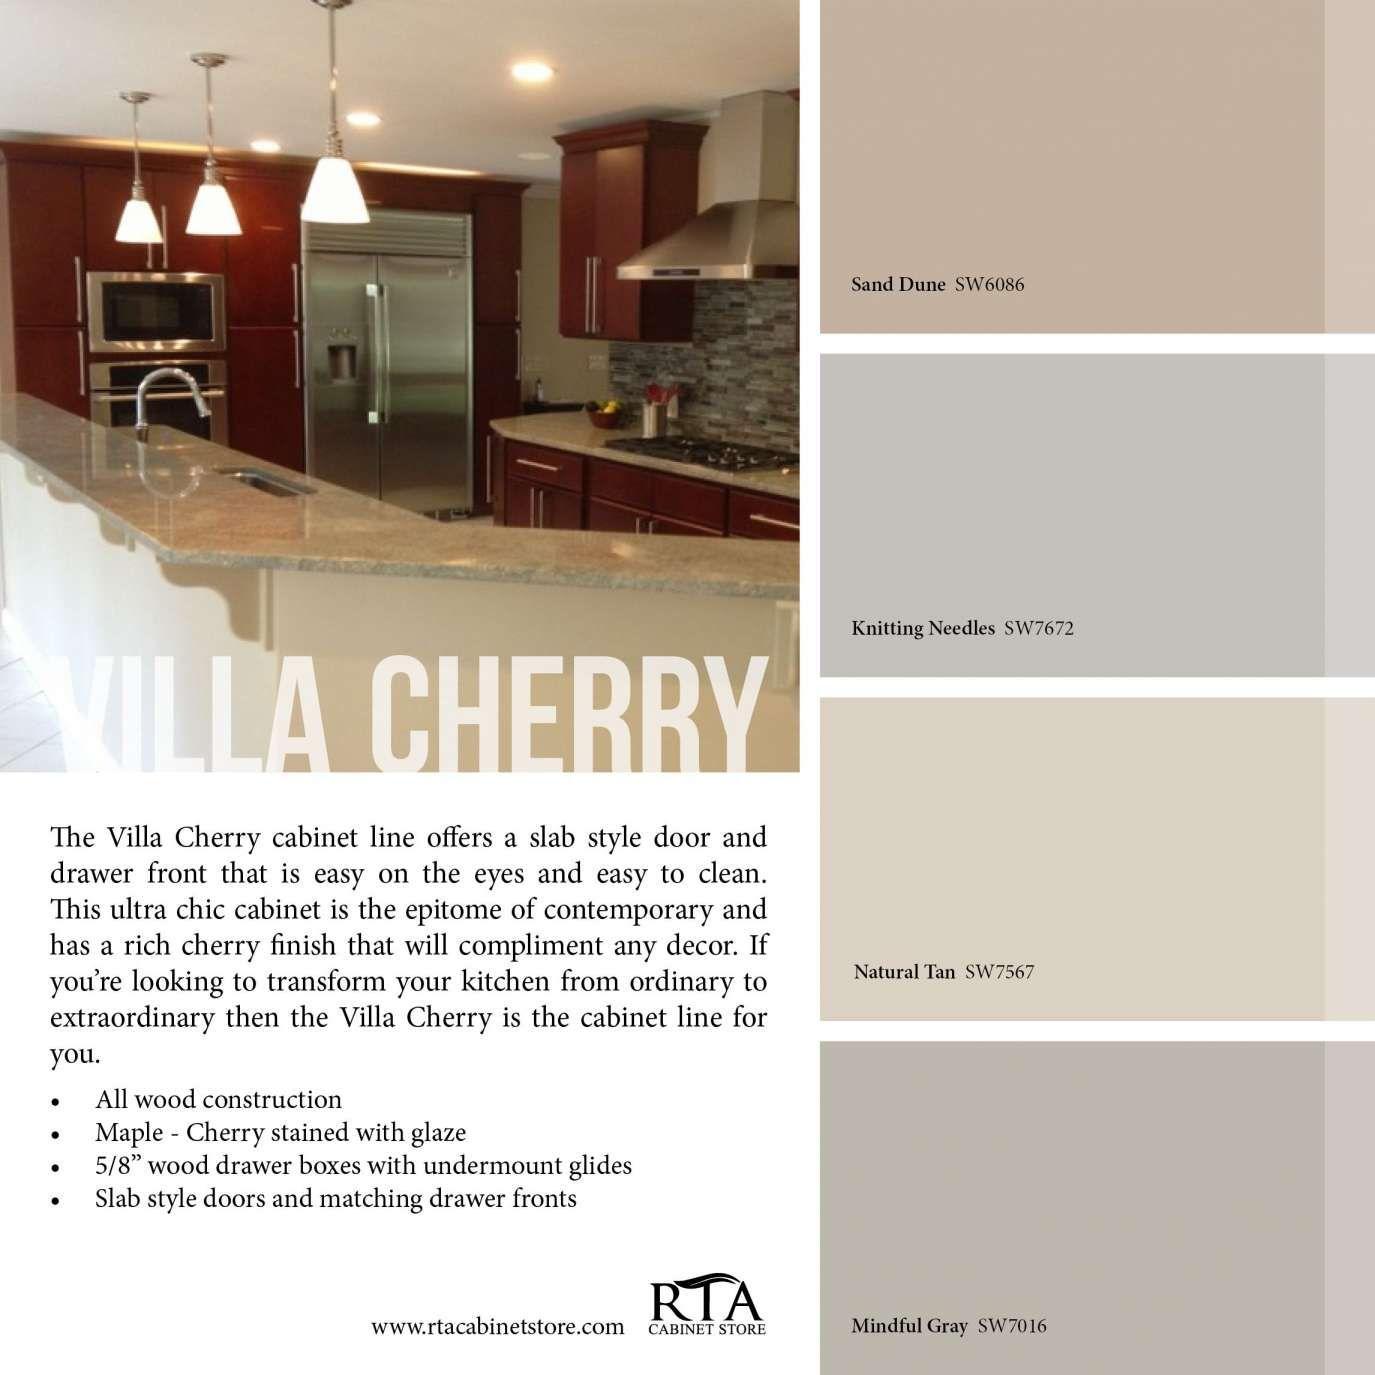 7 Splendid Paint Color Kitchen With Cherry Cabinets Collection Kitchen Paint Colors With Cherry Cherry Wood Cabinets Kitchen Wall Colors